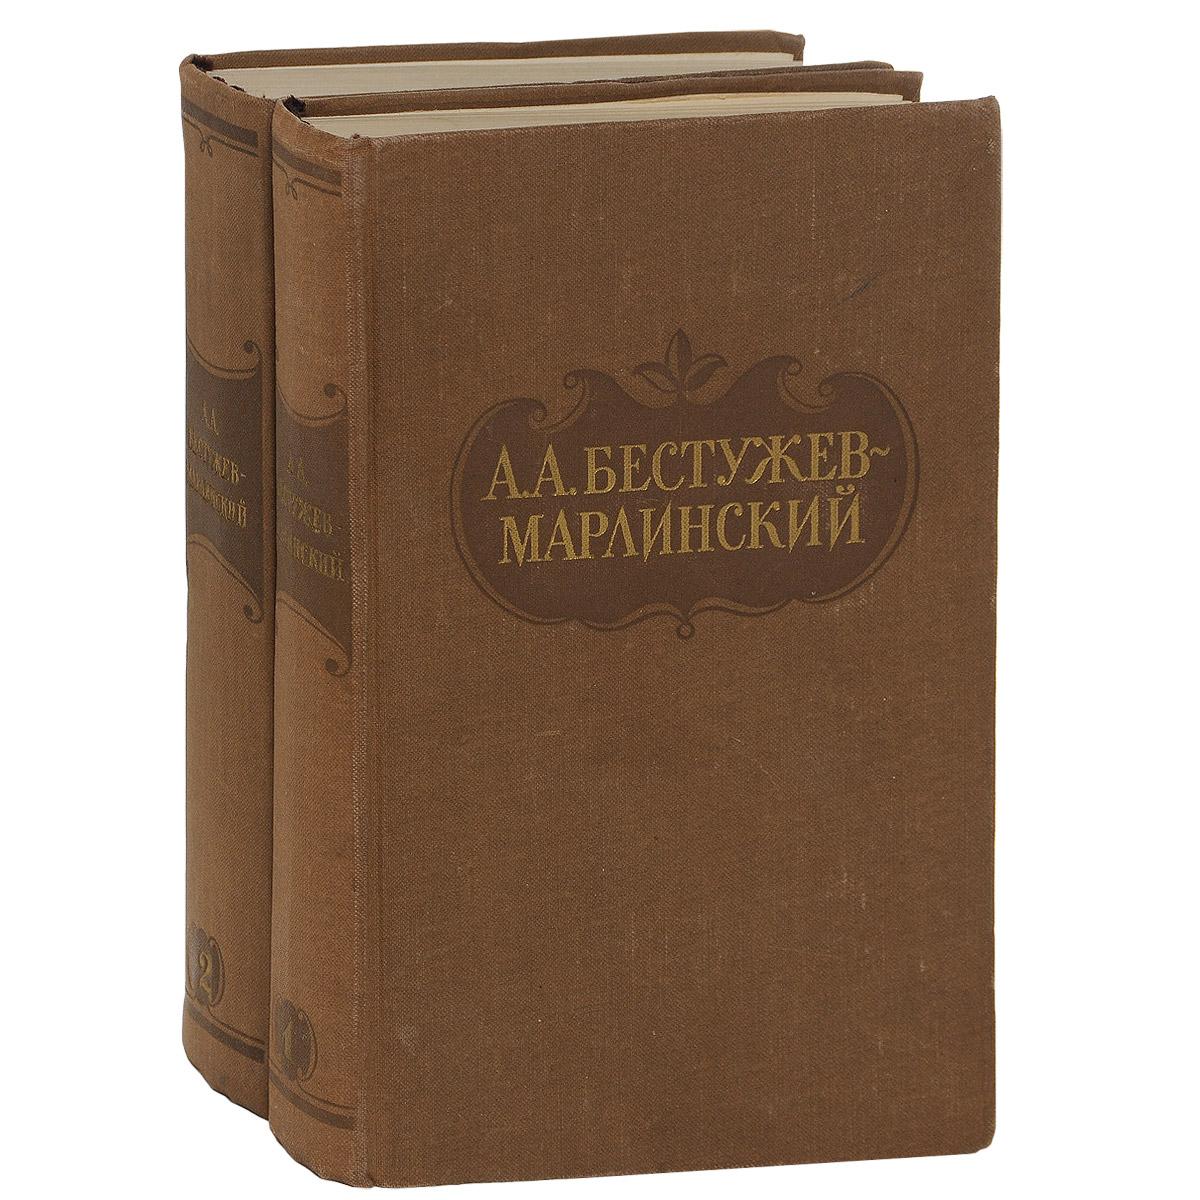 А. А. Бестужев-Марлинский А. А. Бестужев-Марлинский. Сочинения в 2 томах (комплект из 2 книг) хортон а java в двух томах комплект из 2 книг